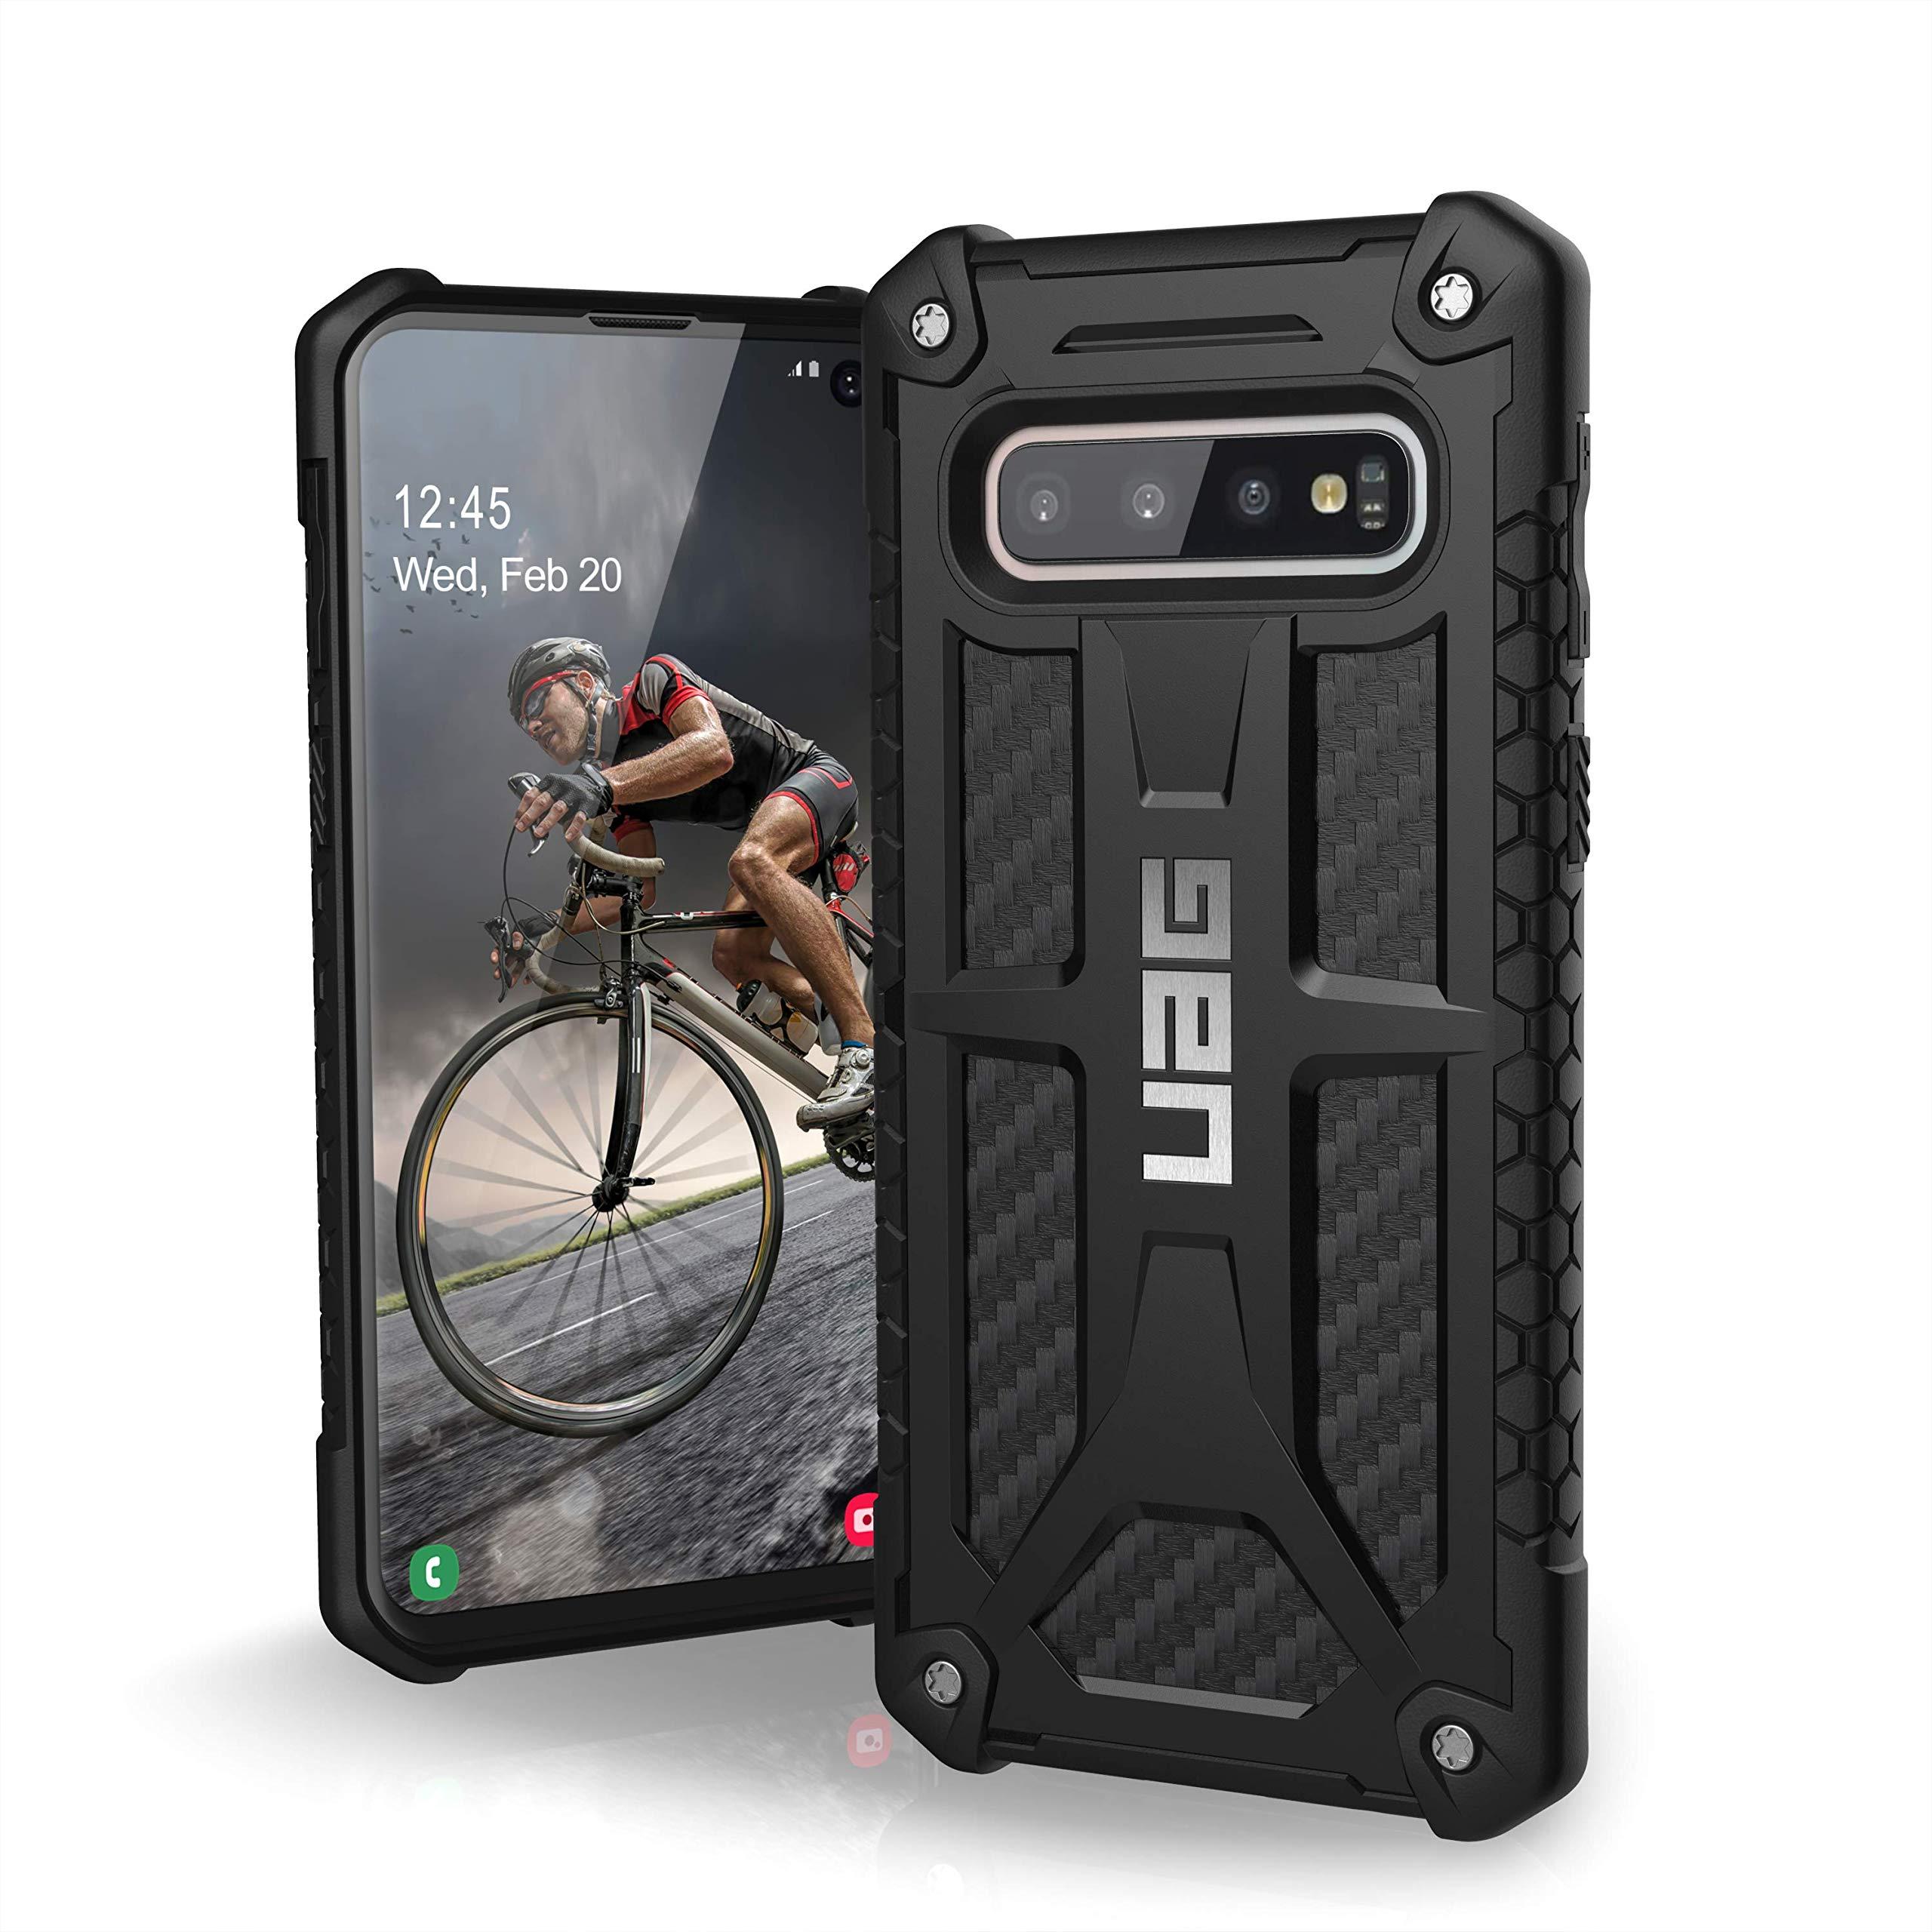 URBAN ARMOR GEAR UAG Designed for Samsung Galaxy S10 [6.1-inch Screen] Monarch [Carbon Fiber] Military Drop Tested Phone Case